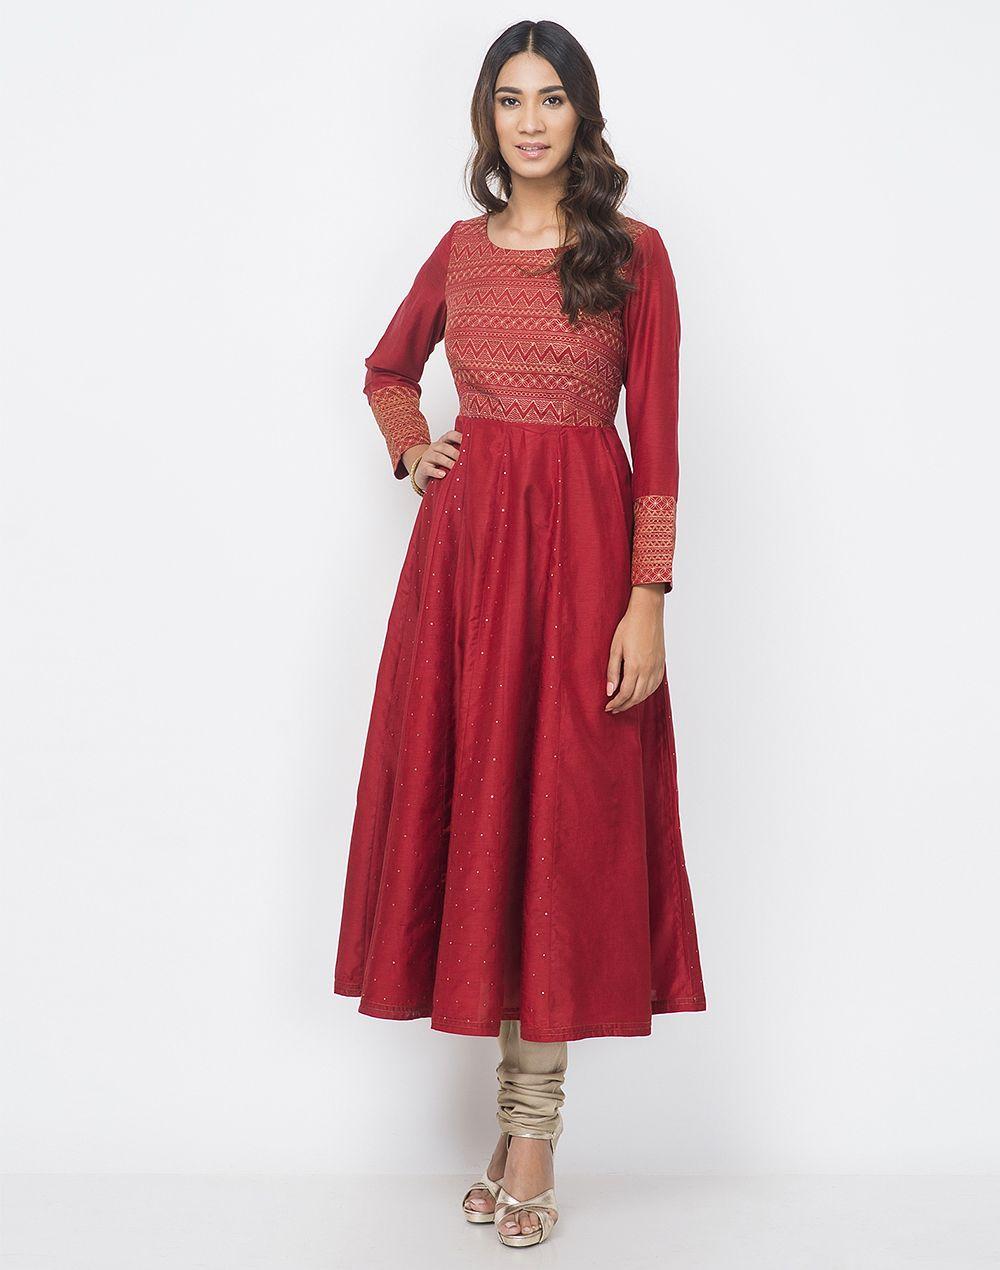 Cotton silk aari embroidered yoke slim fit long kurta kurtas